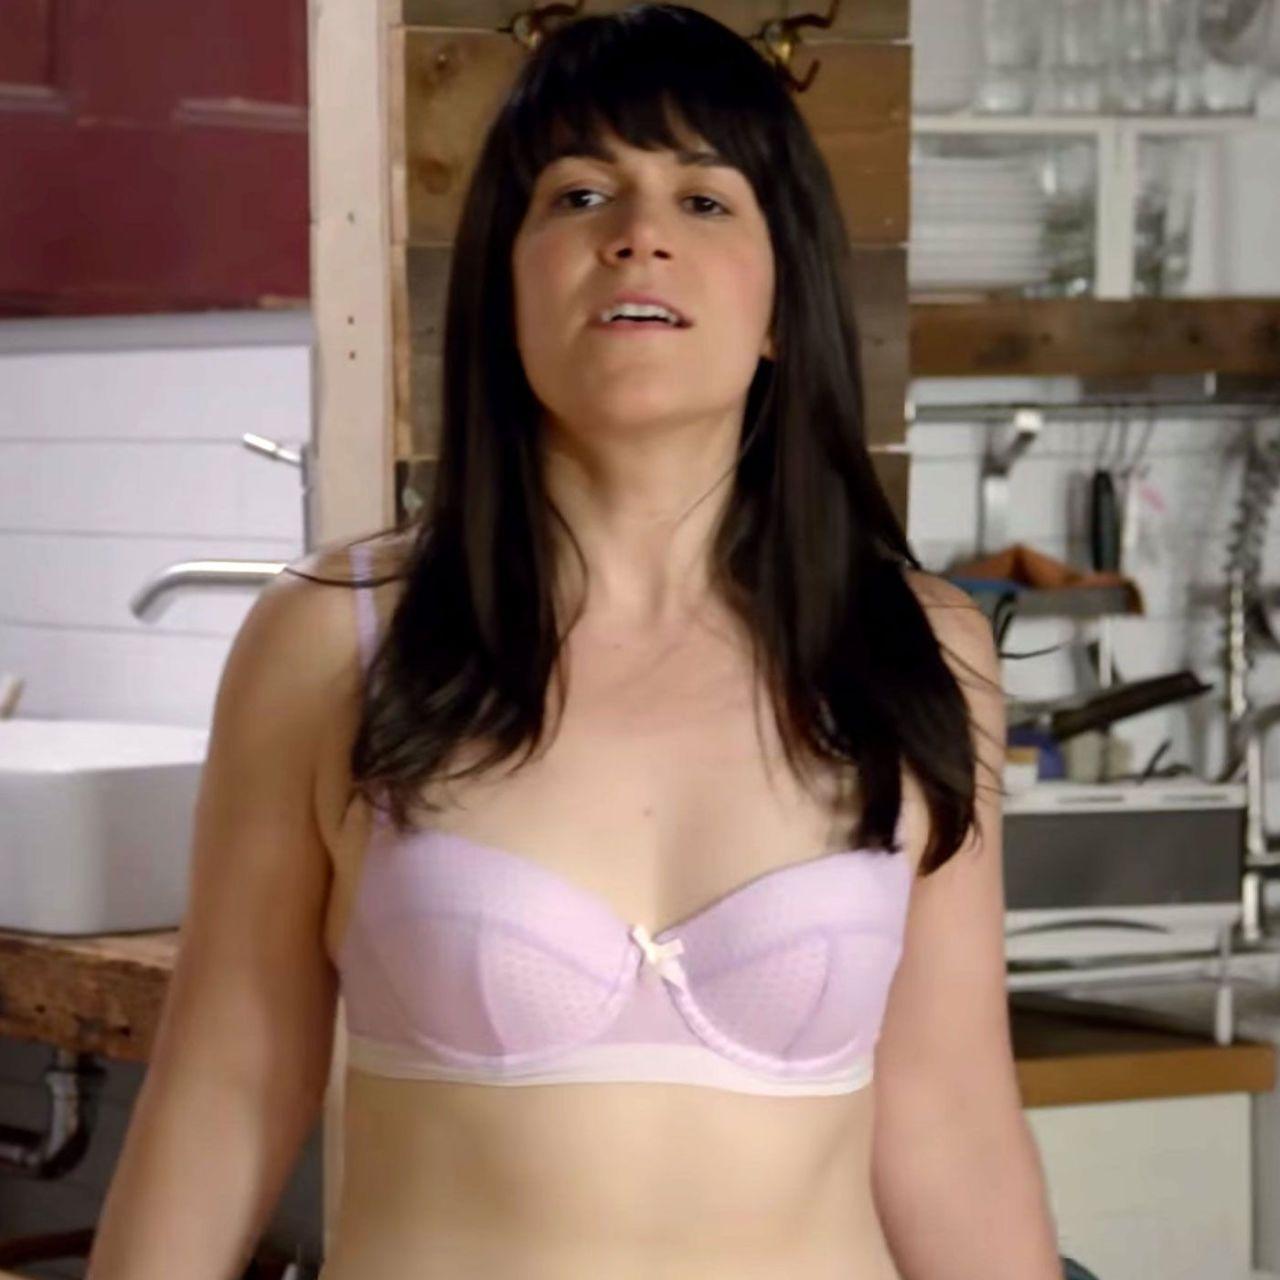 Free orgy porn video